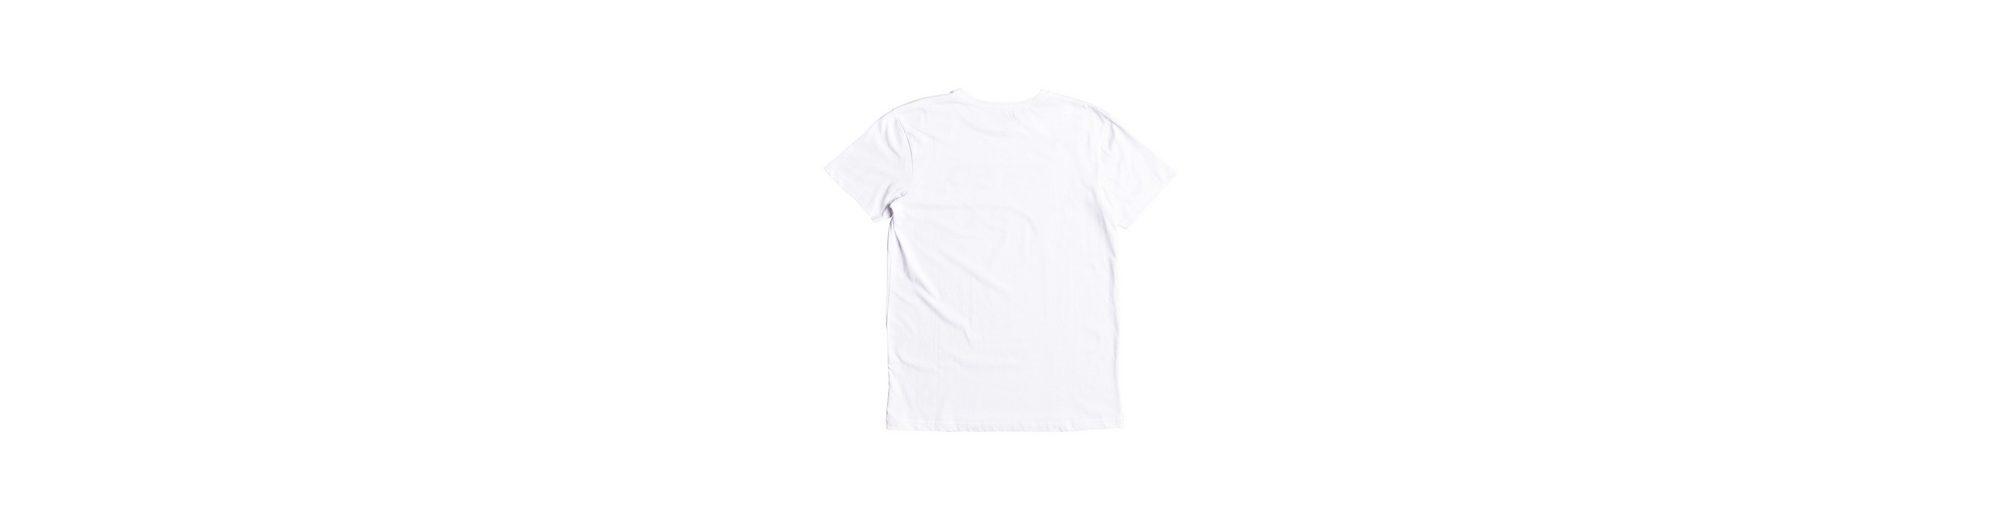 Quiksilver T-Shirt Sust East Need Art Freies Verschiffen 100% Original Auslass Offiziellen Authentischer Online-Verkauf oDFTJUJGu